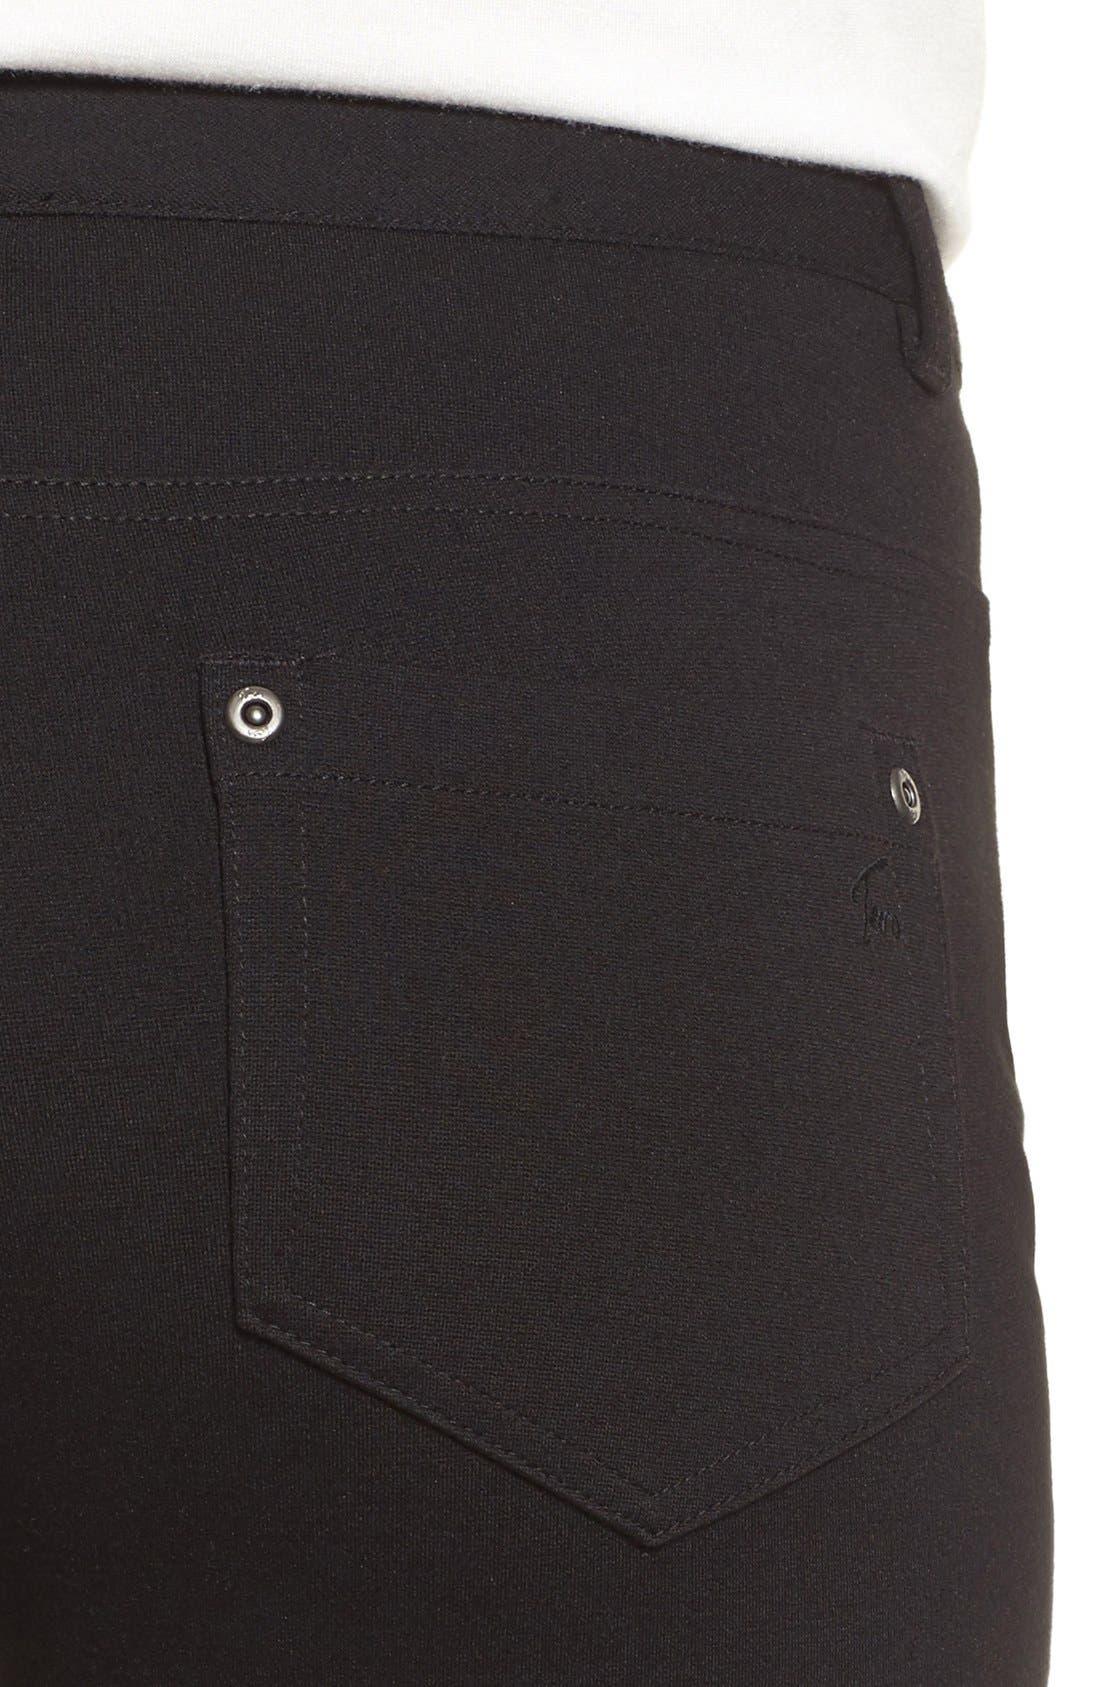 Alternate Image 4  - Two by Vince Camuto Skinny Ponte Pants (Regular & Petite)